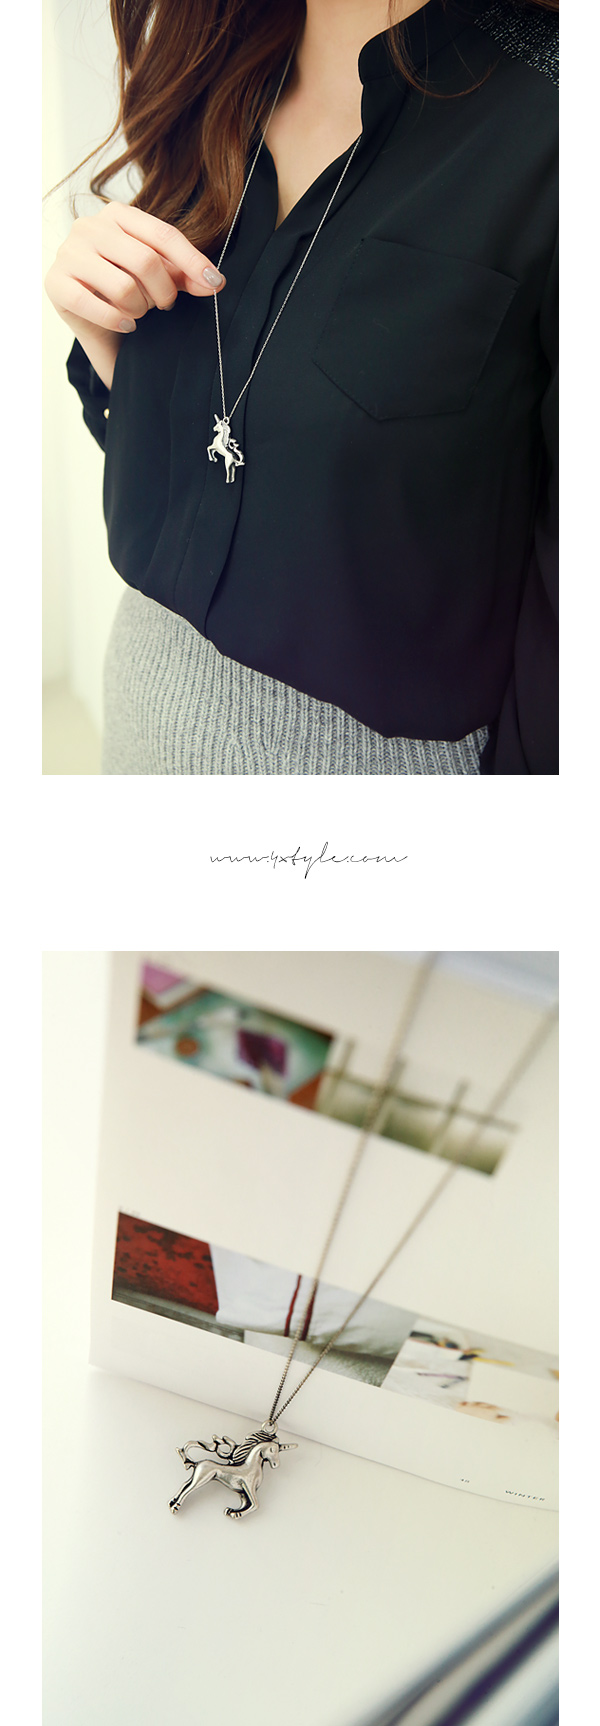 [ 4xtyle ] 独角兽长的项链,一种颜色